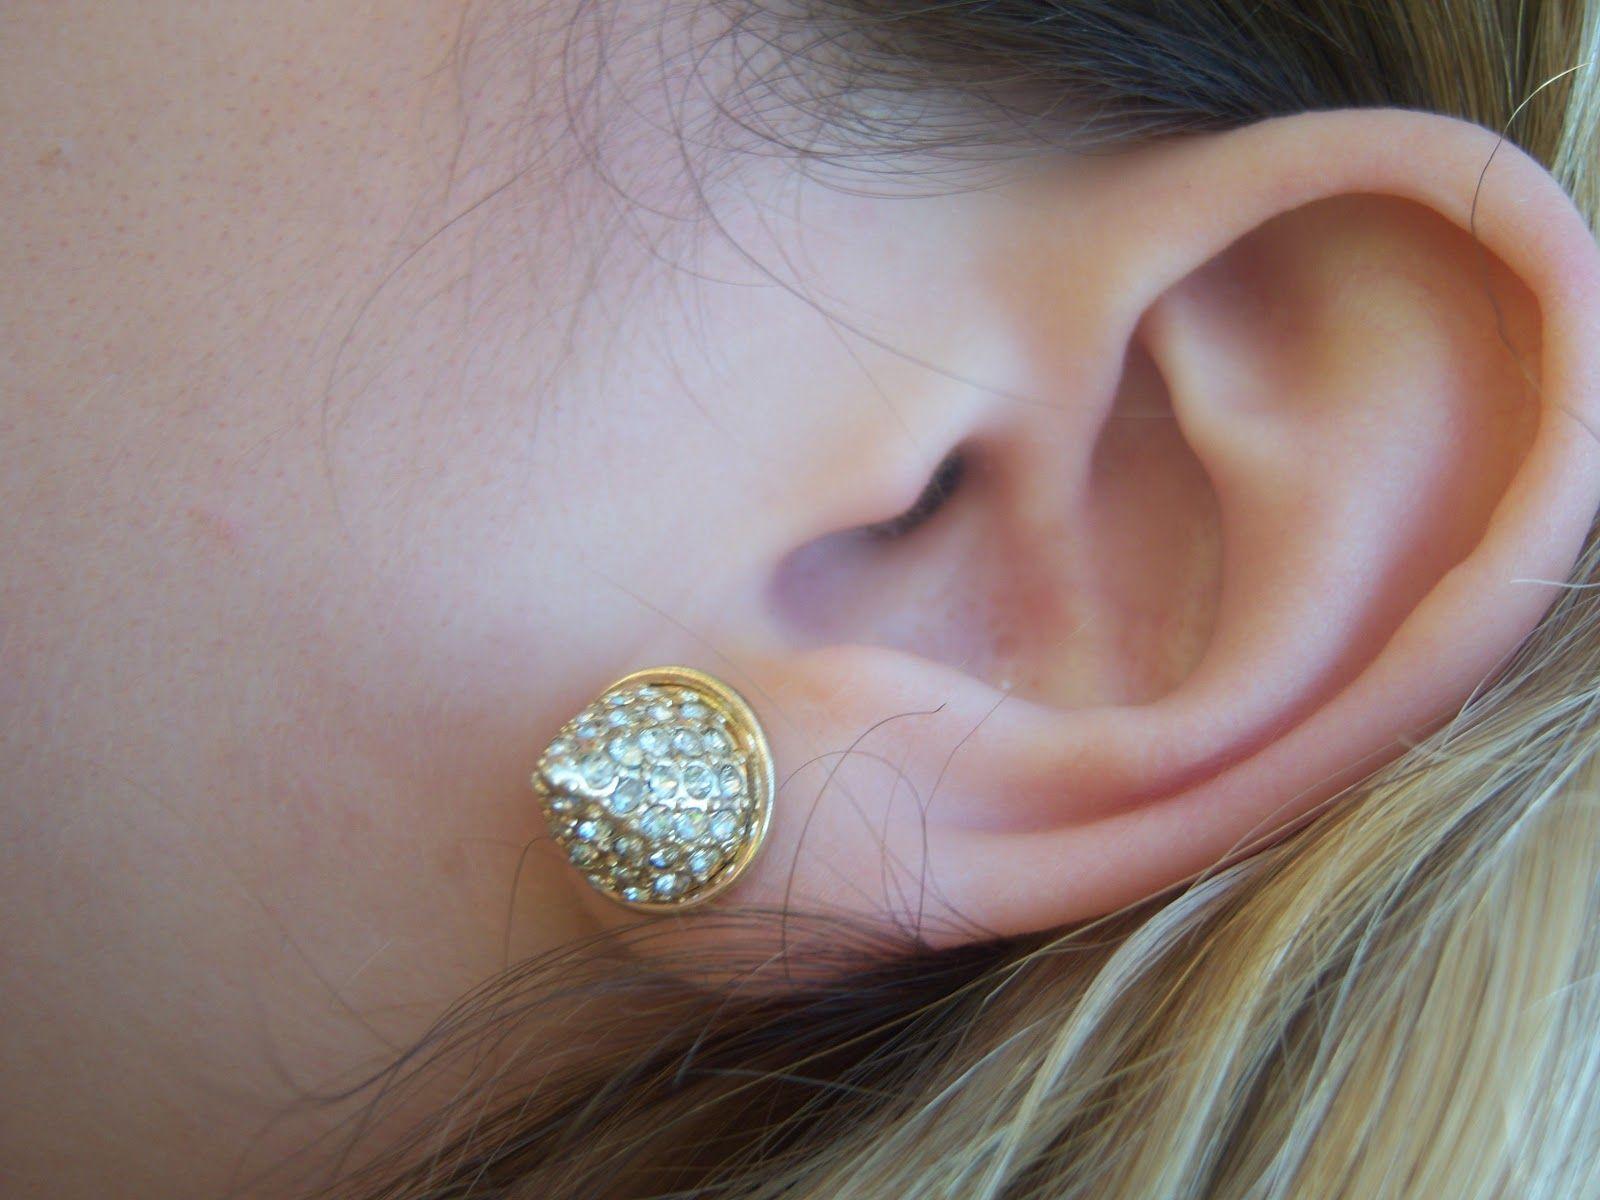 Little Black Bag: All the Rage - Pyramid Stud Earrings